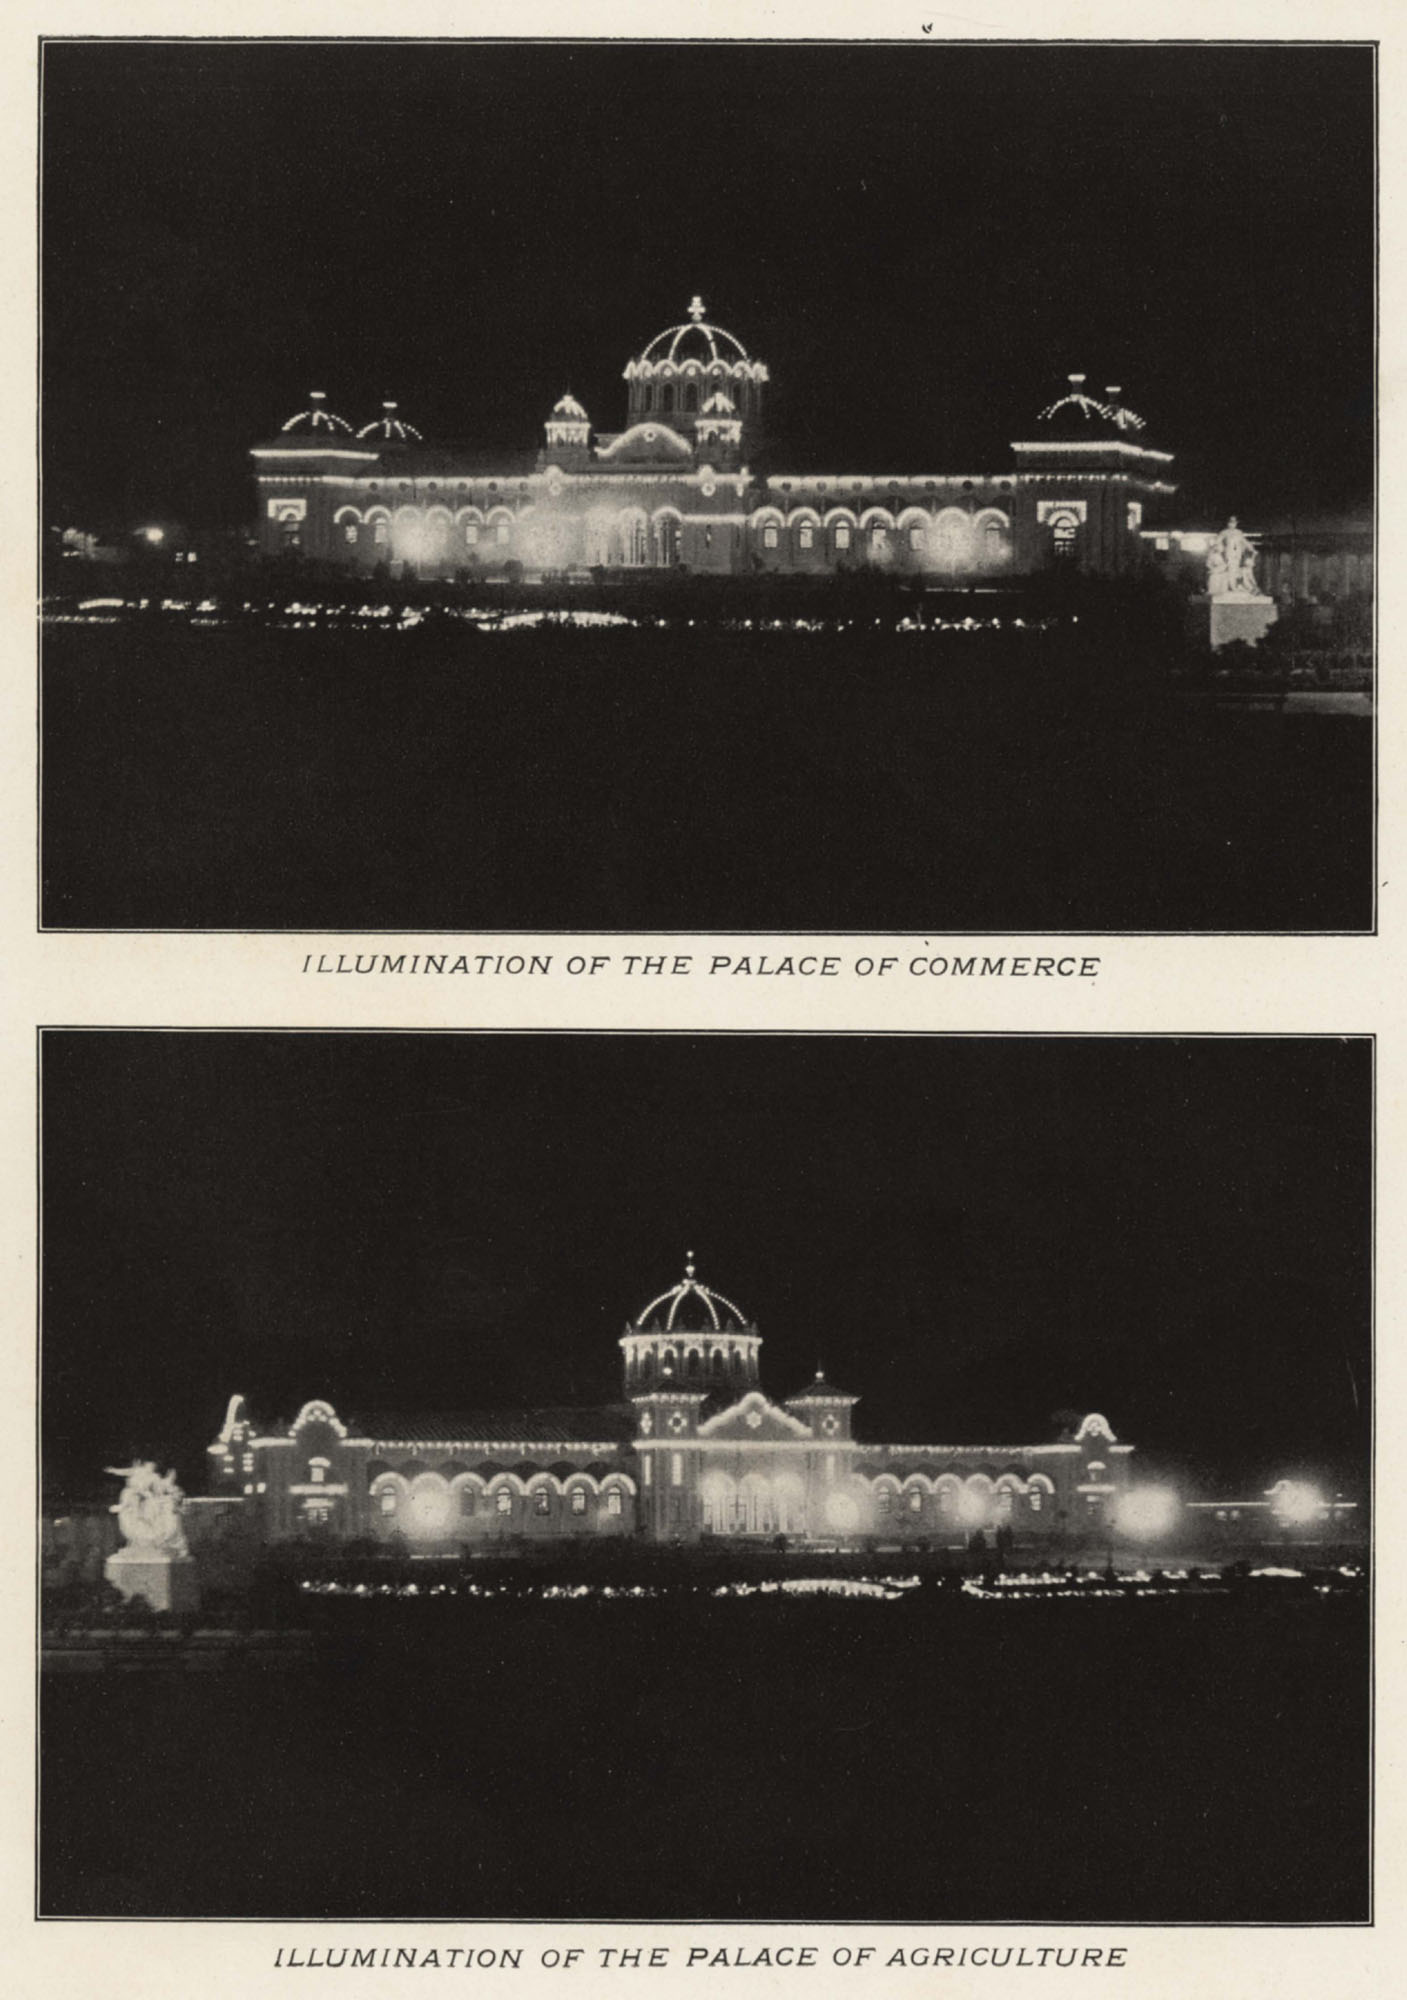 Illumination of the Palaces